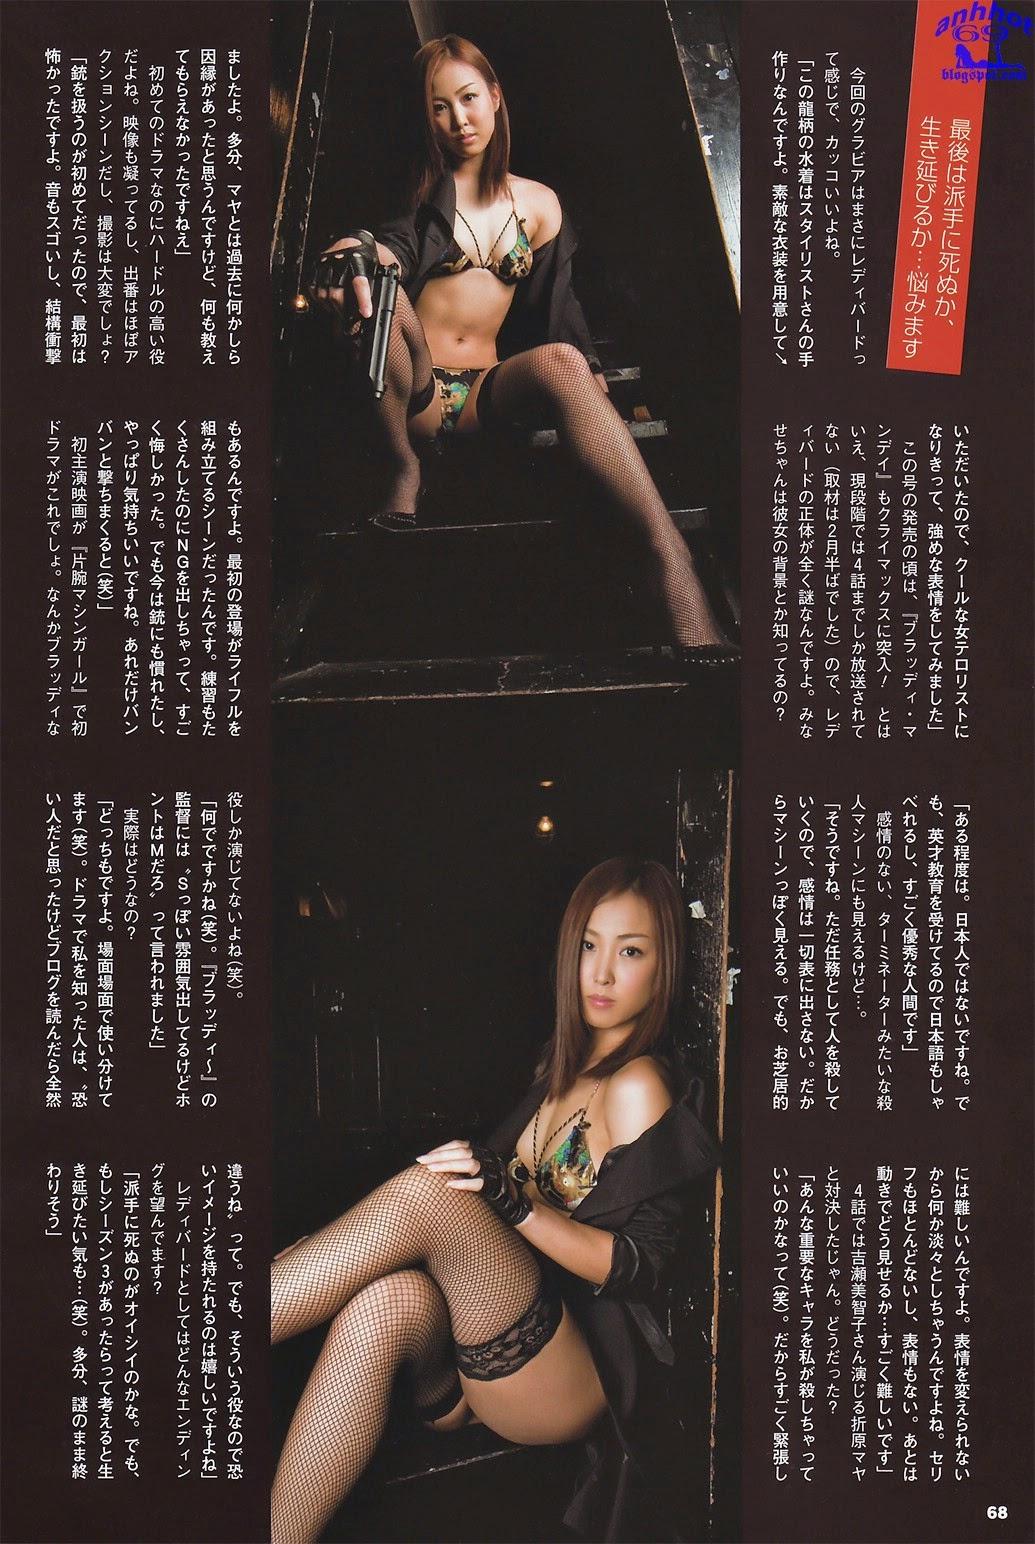 minase-yashiro-00635046